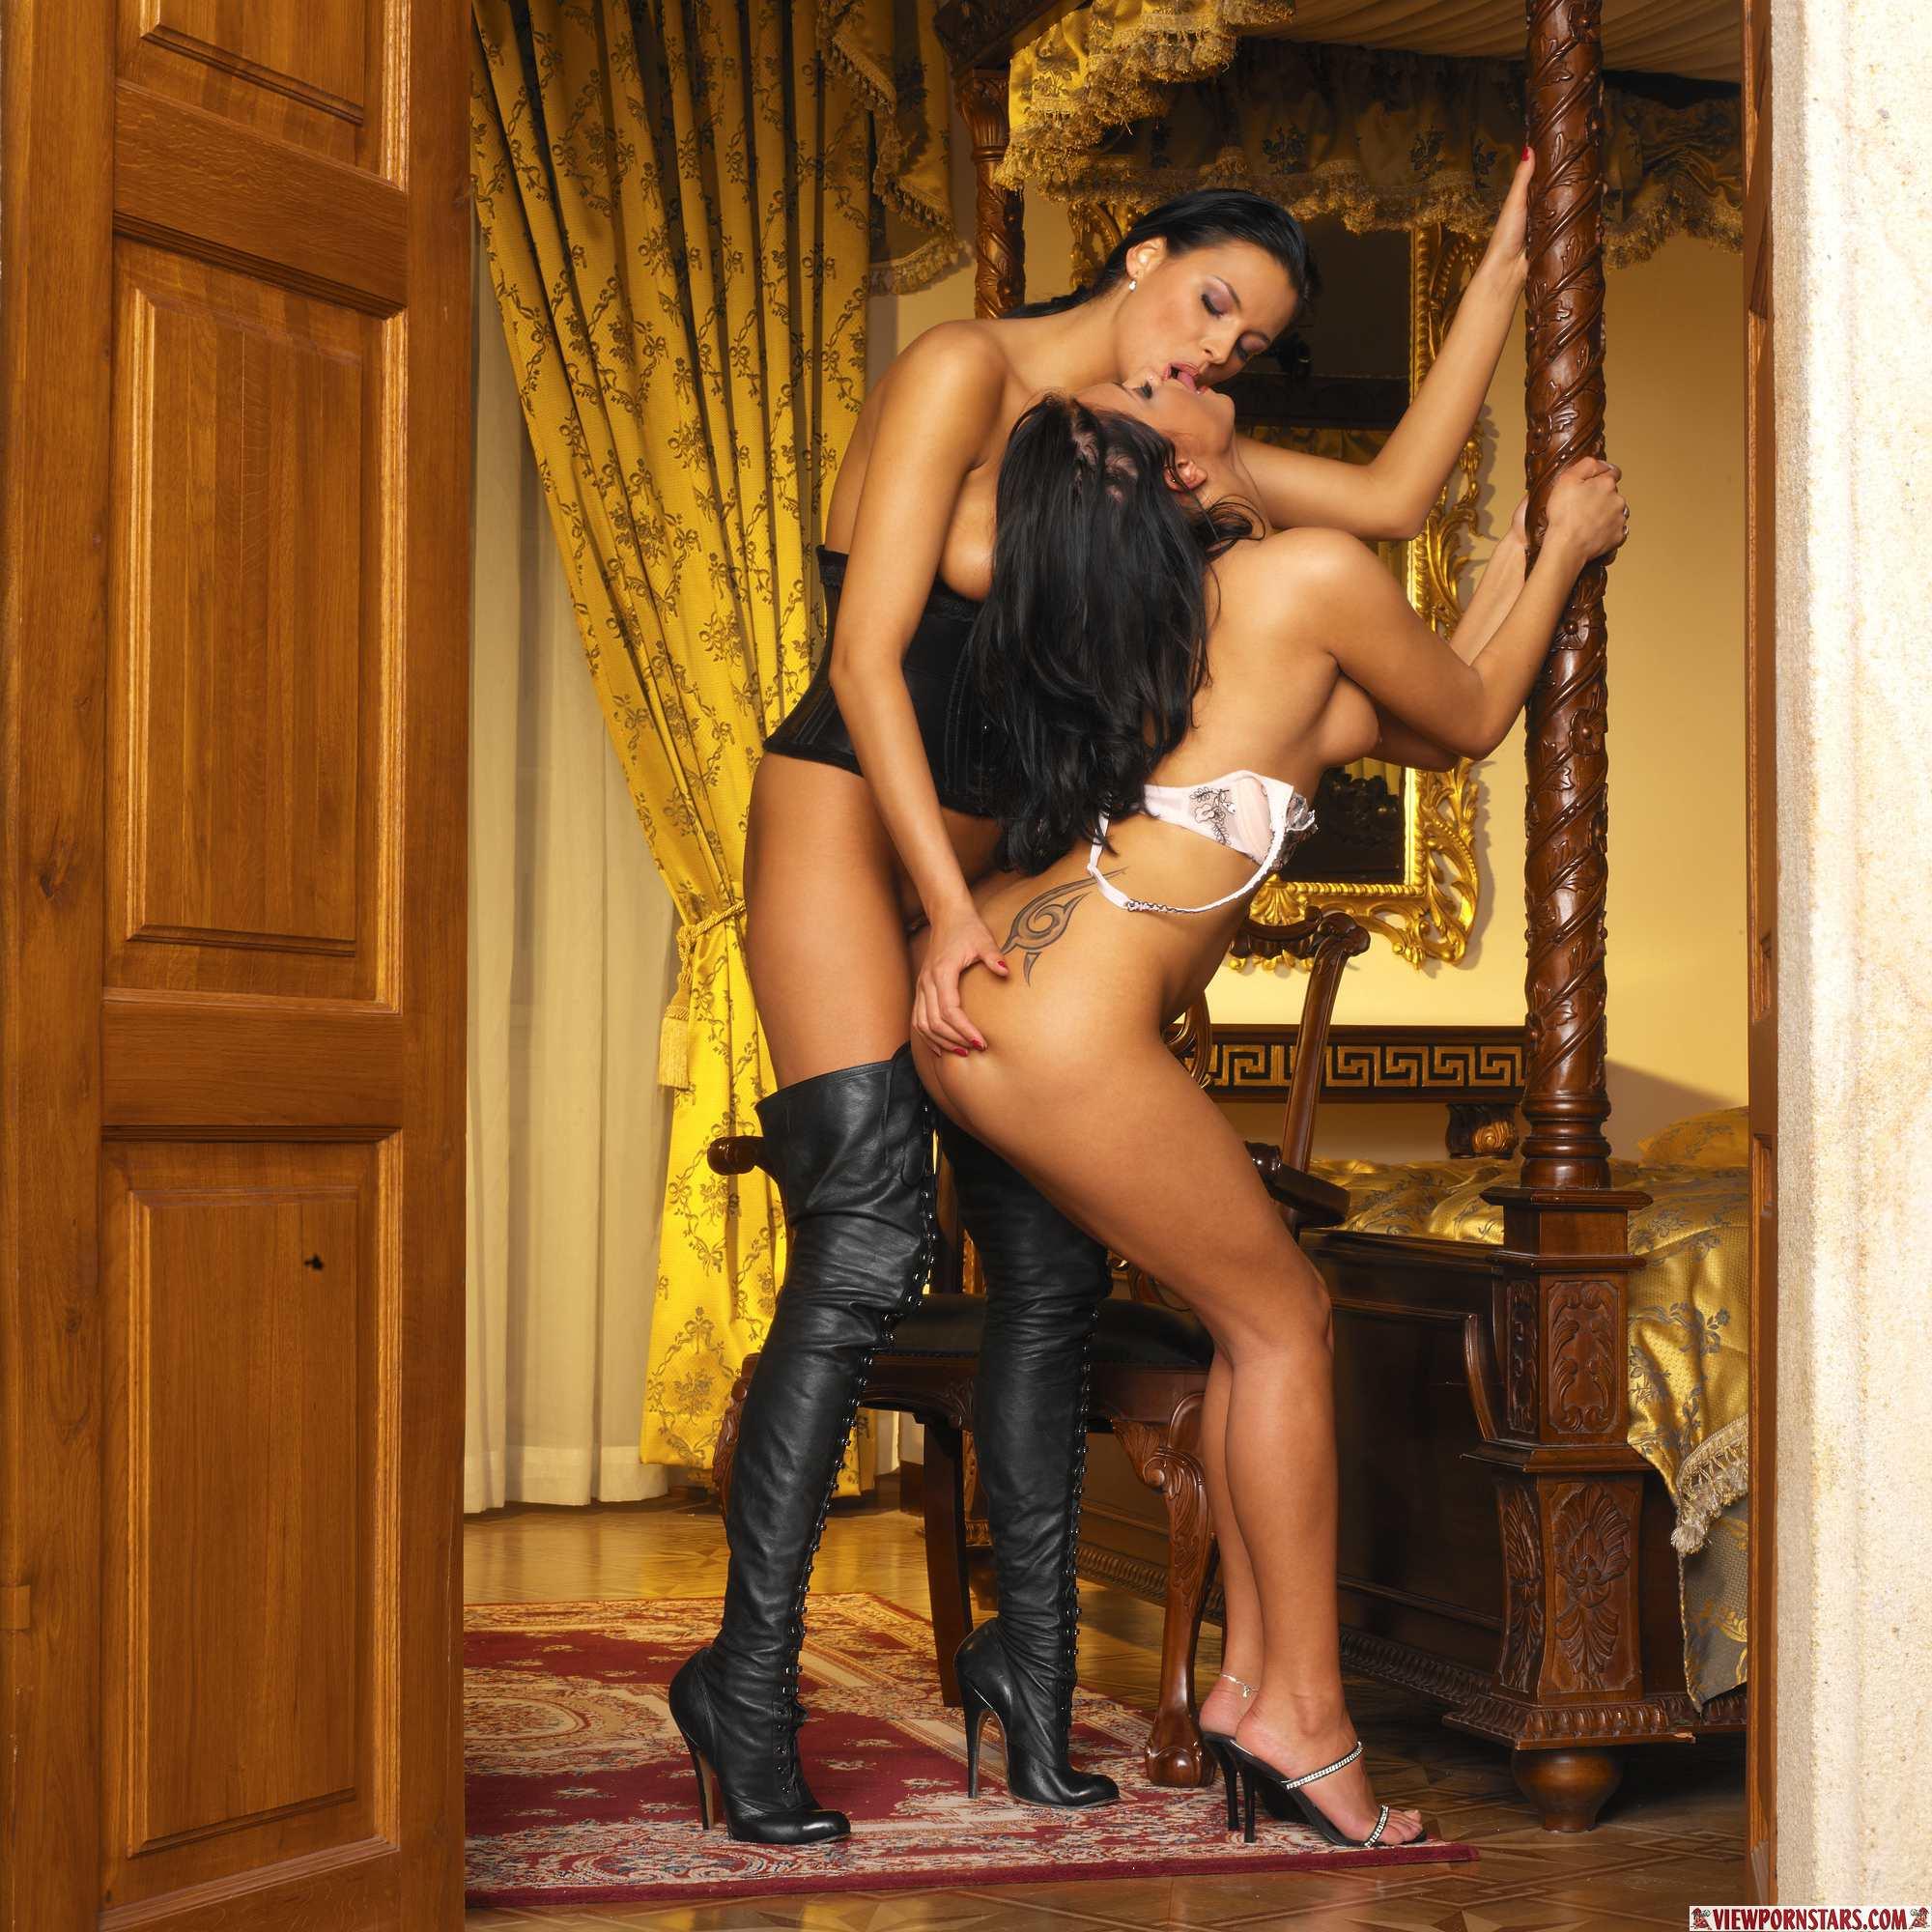 Anetta Keys Porn Sex showing xxx images for anetta keys lesbian dildo xxx | www